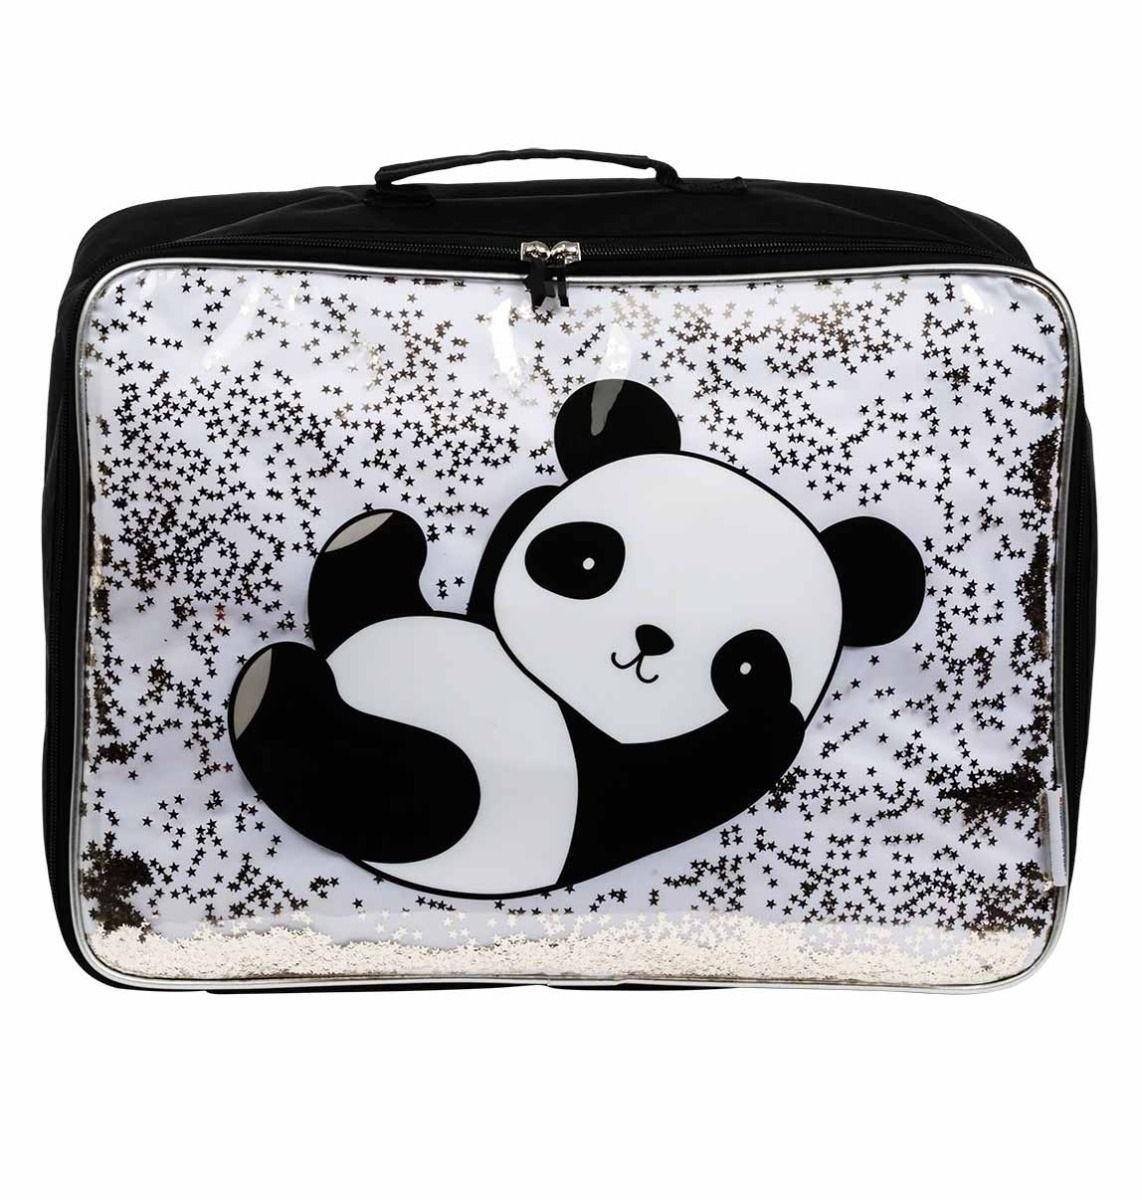 A Little Lovely Company - Suitcase: Glitter - panda